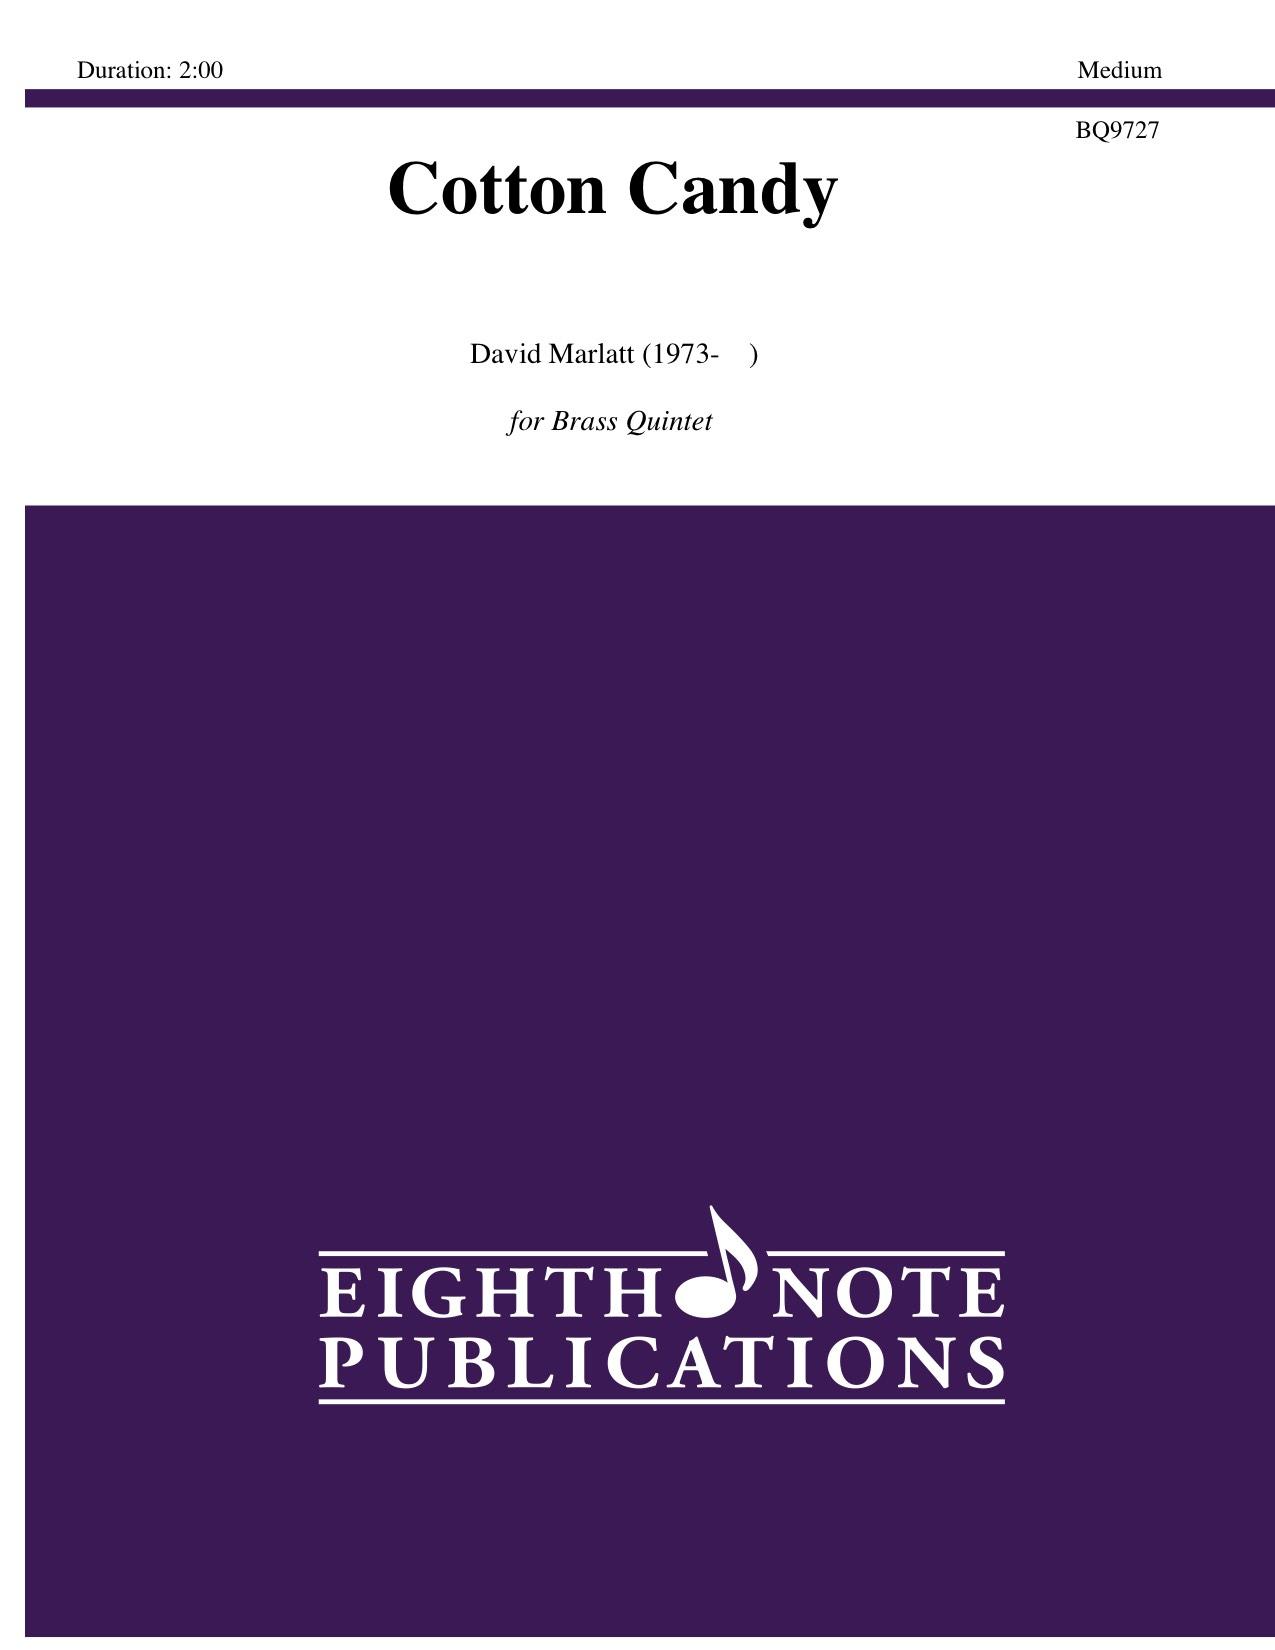 Cotton Candy - David Marlatt